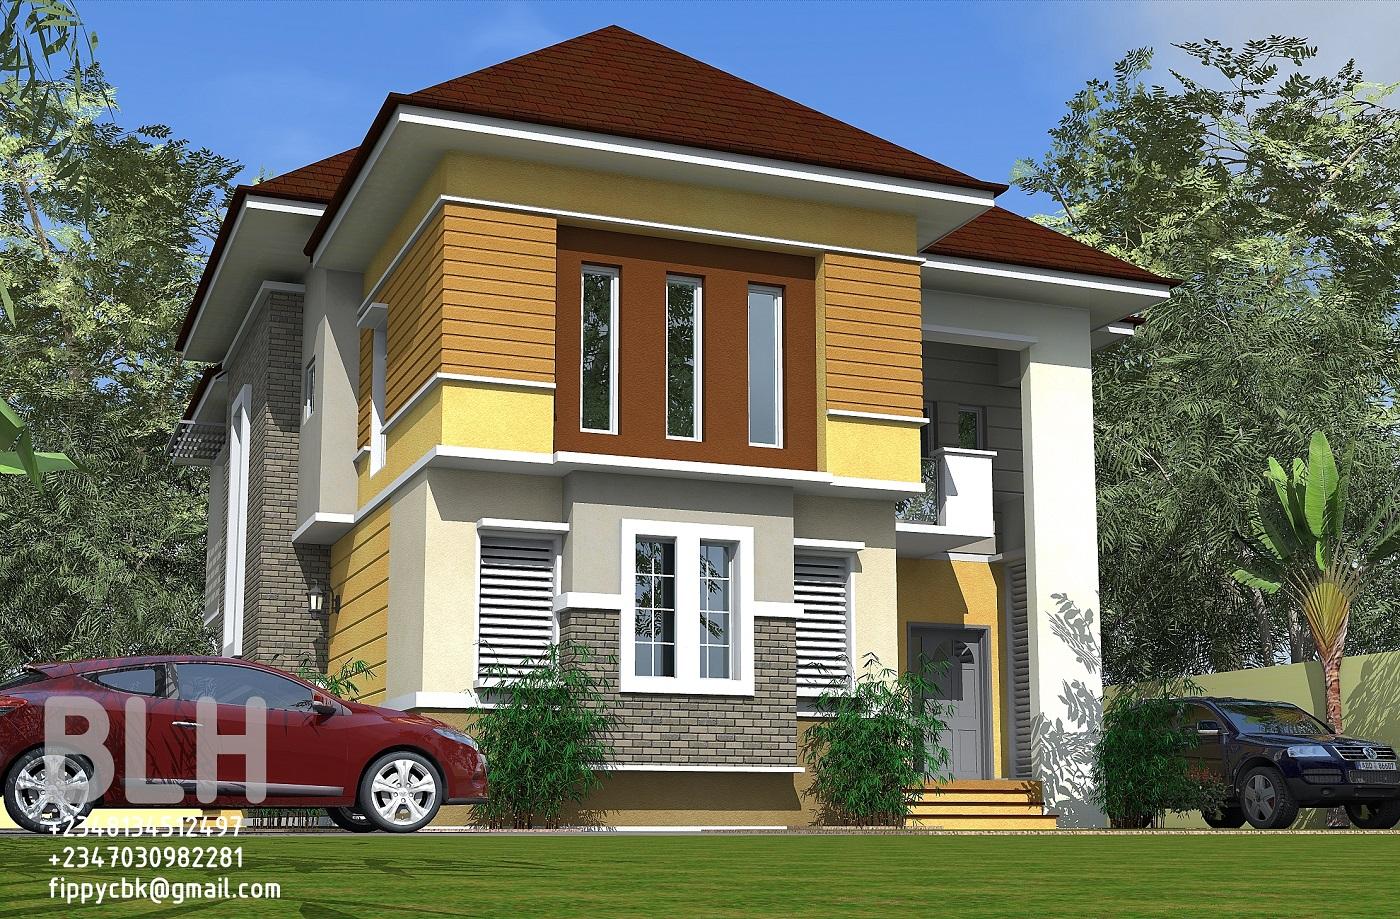 Architectural designs by blacklakehouse 4 bedroom duplex for Duplex designs